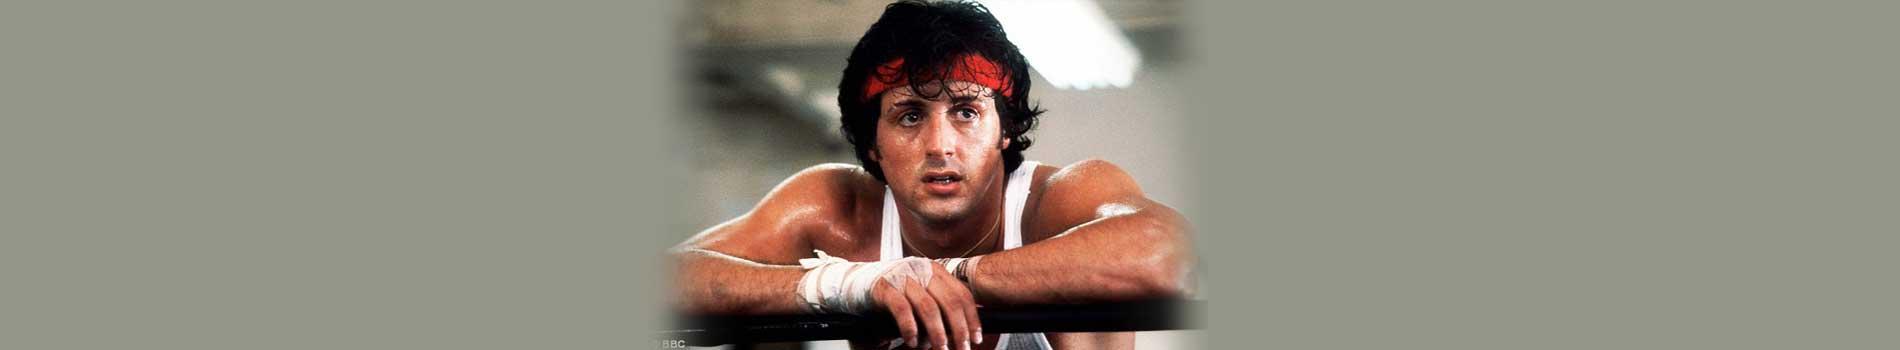 Rocky-slider-image